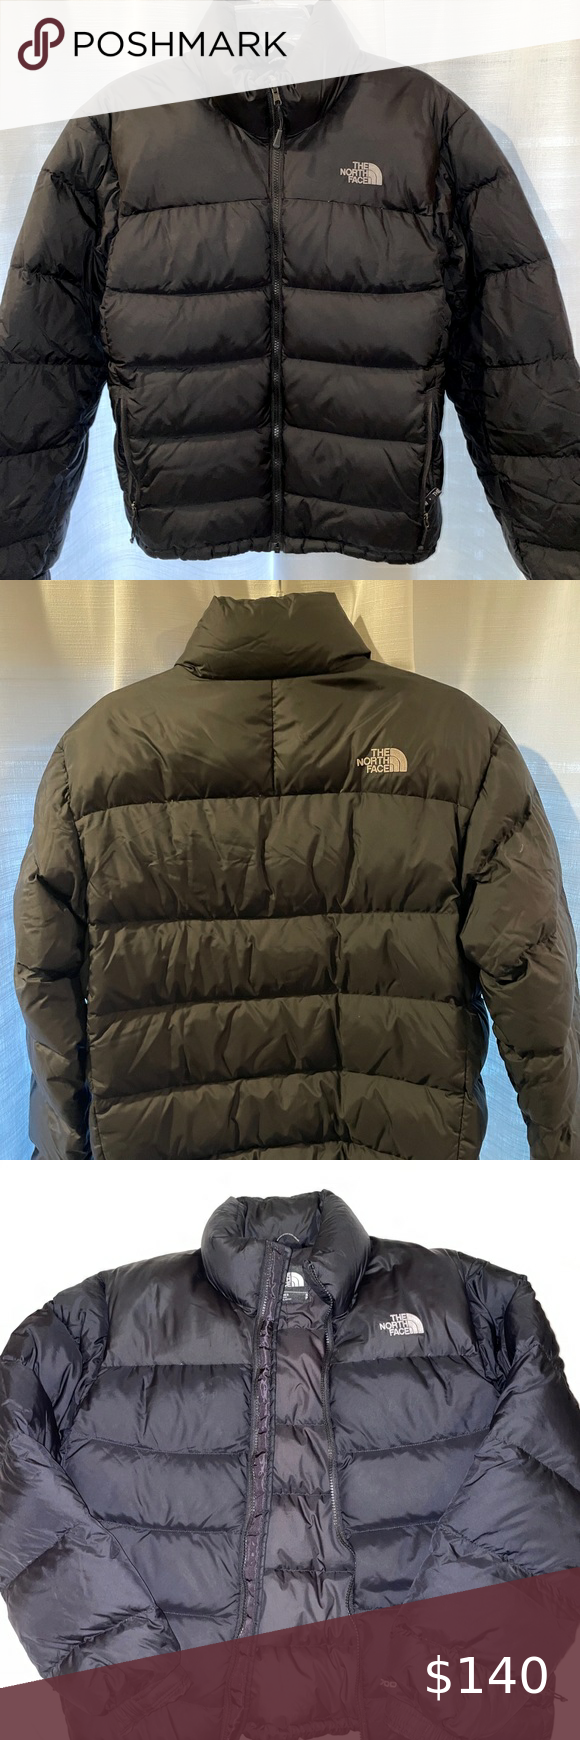 Northface Men S 700 Black Puffer Jacket Small Black Puffer Jacket North Face Jacket Mens Black Puffer [ 1740 x 580 Pixel ]